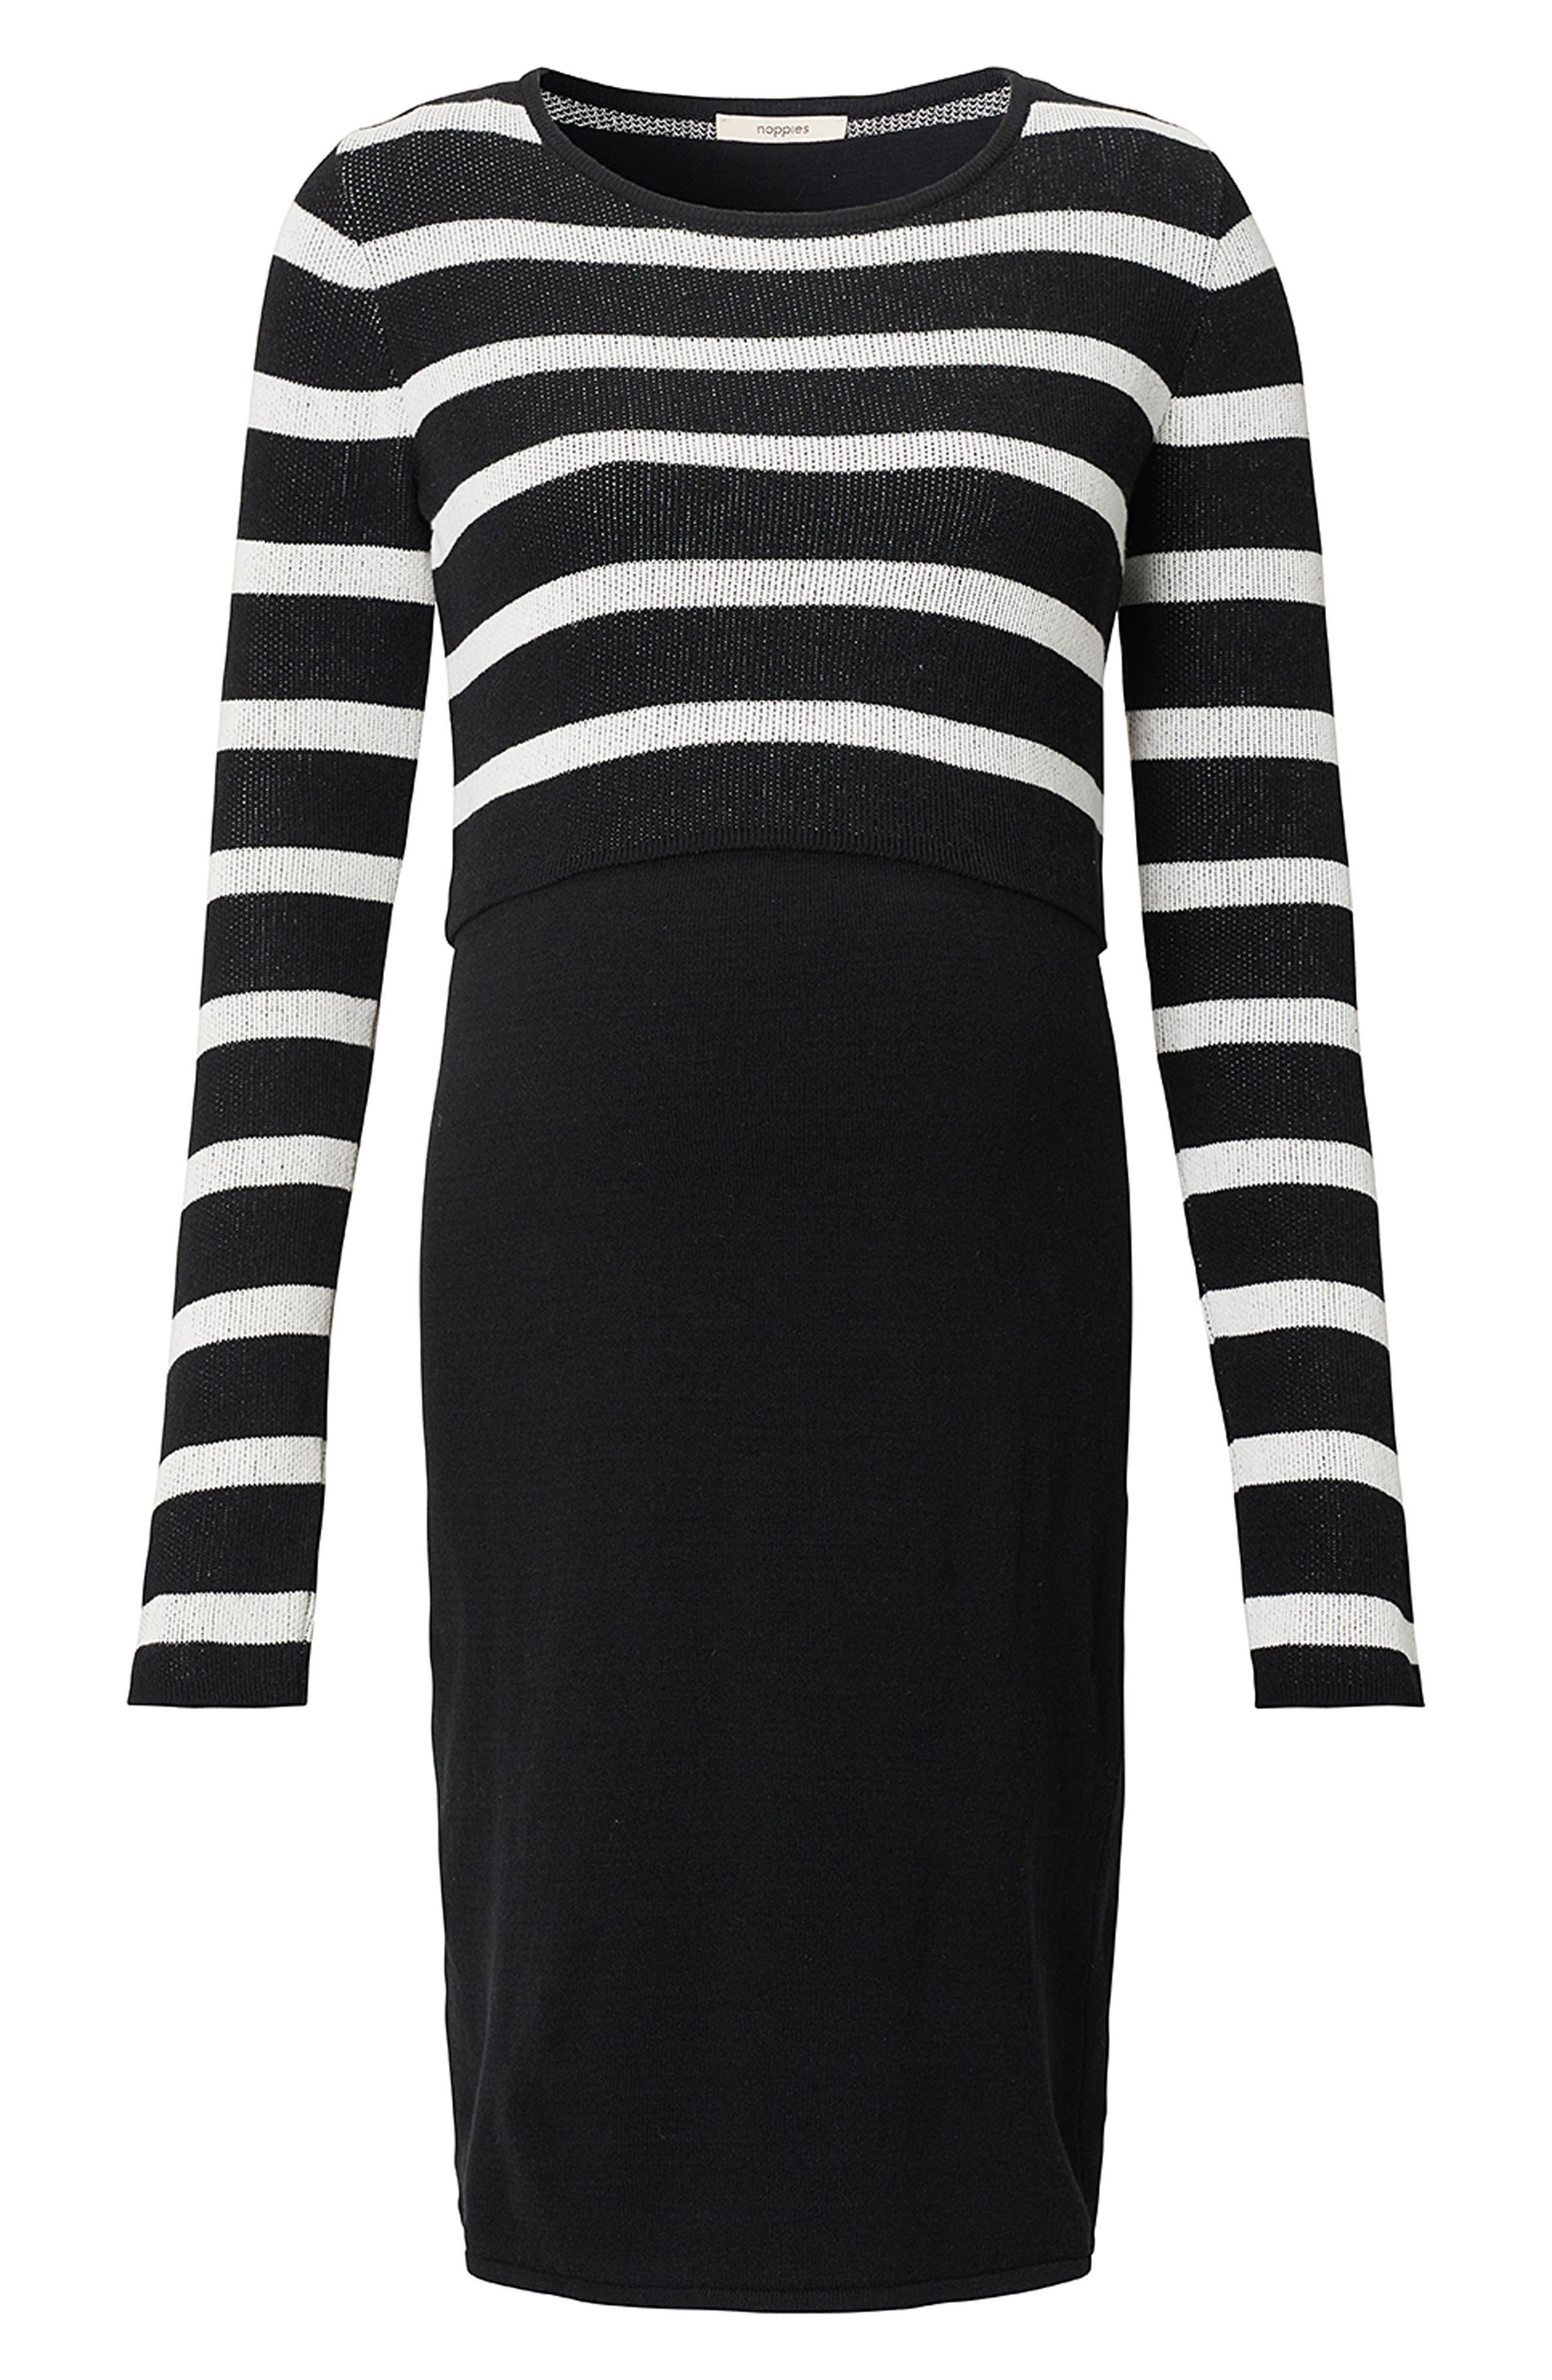 Imara Nursing/Maternity Dress,                         Main,                         color, Black